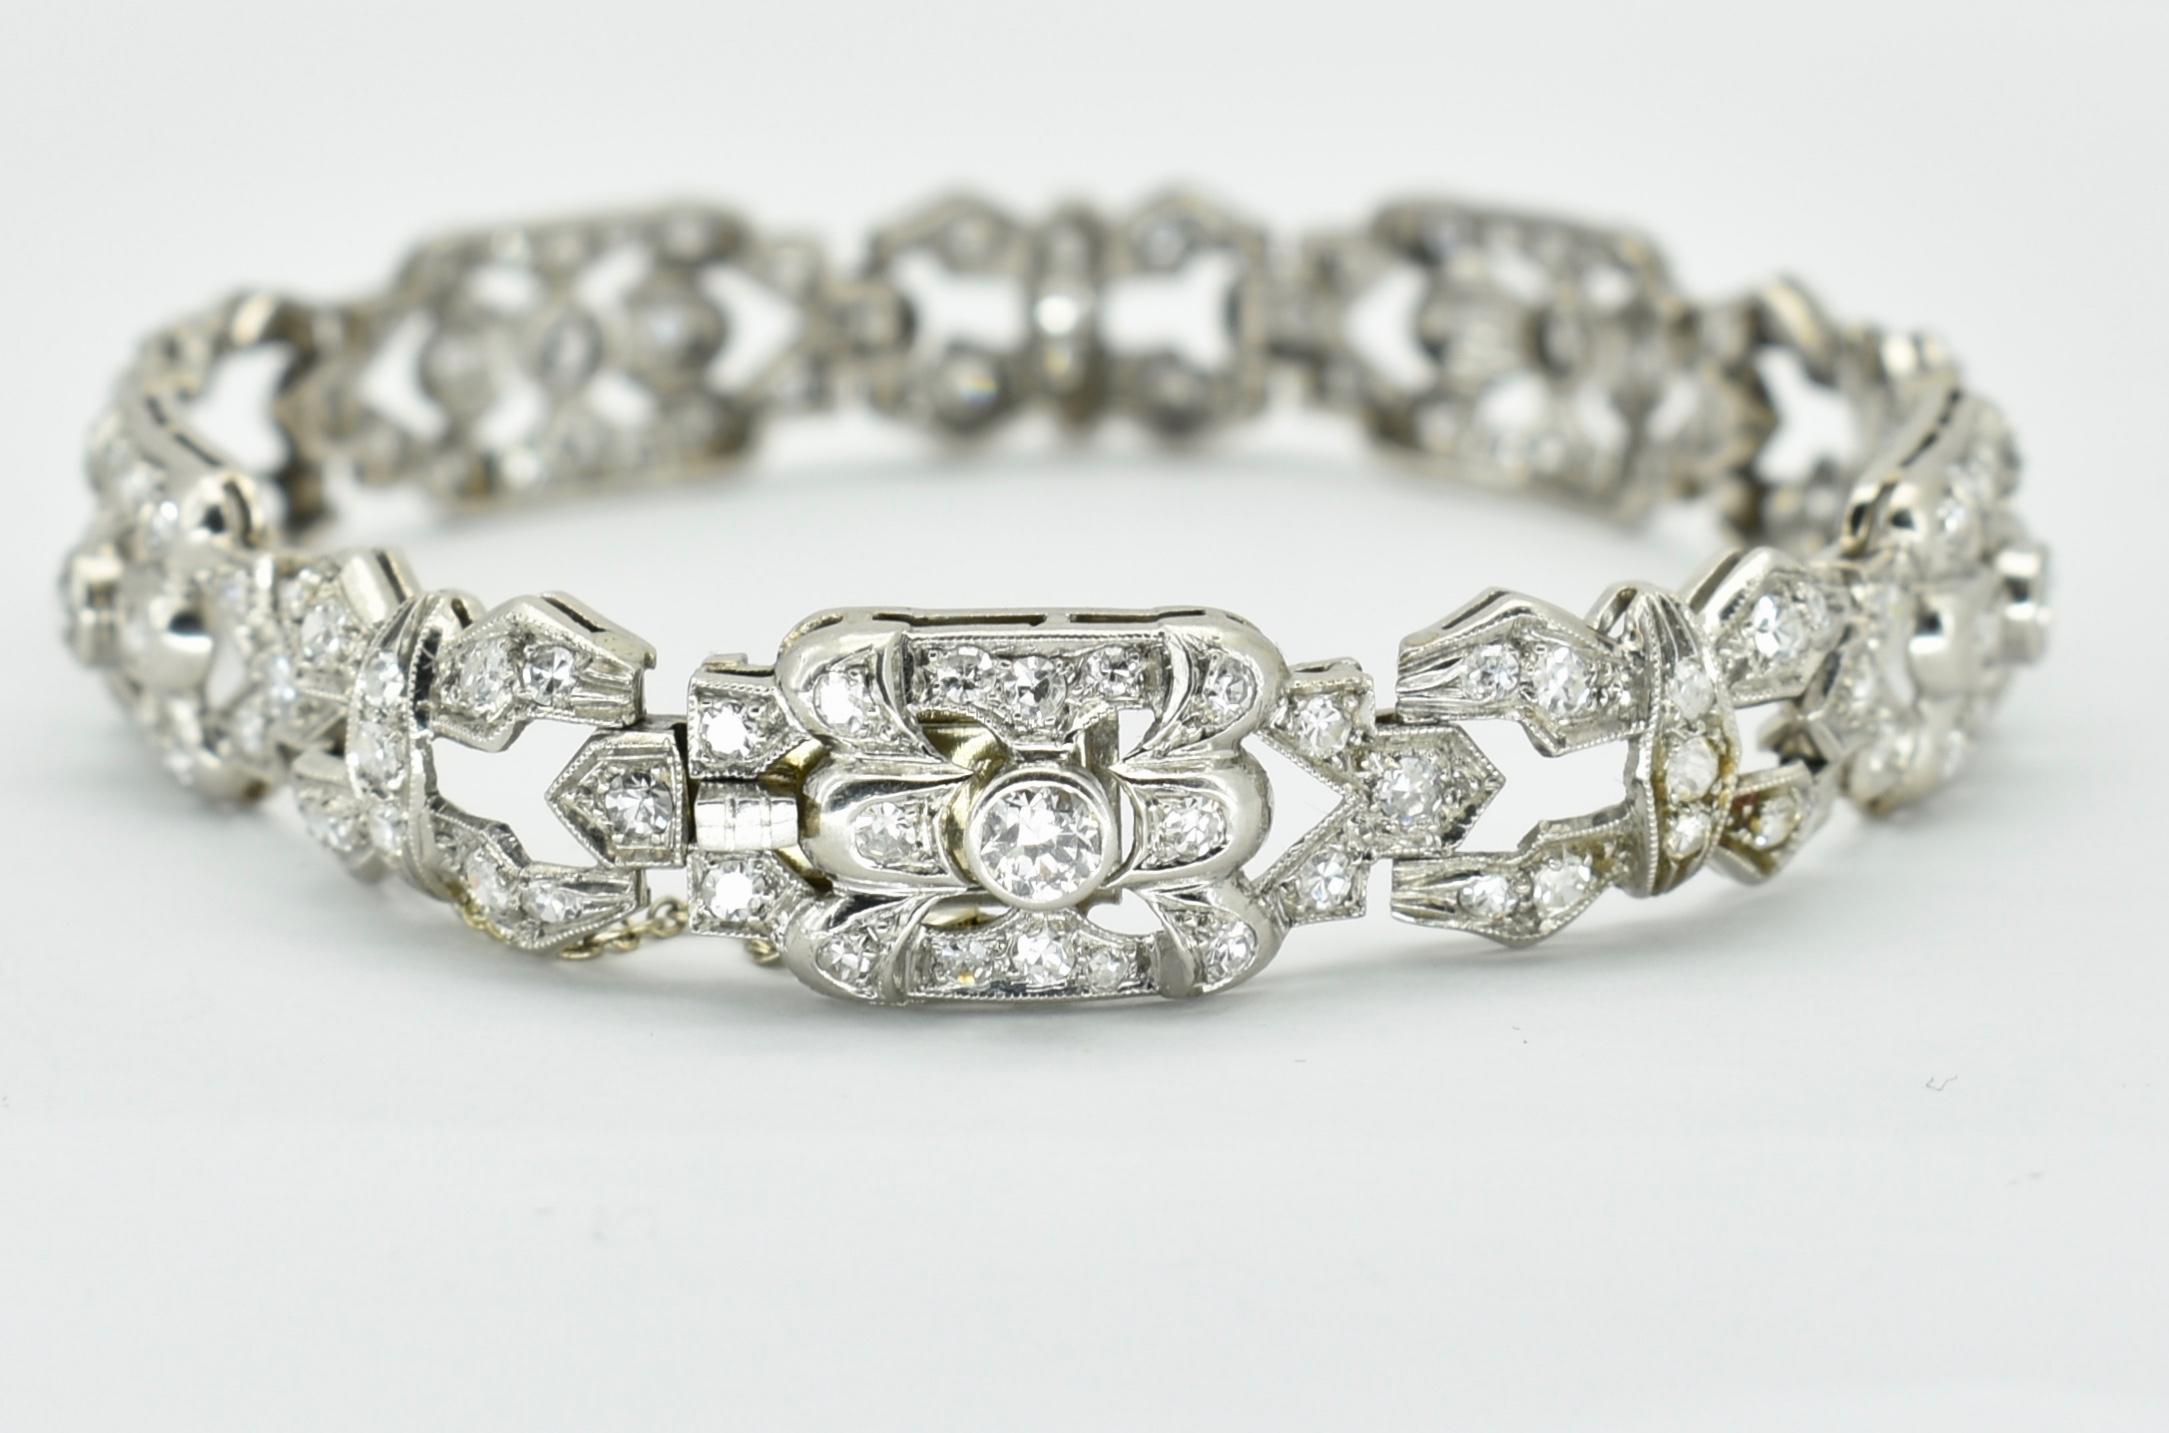 FRENCH ANTIQUE 18CT WHITE GOLD PLATINUM & DIAMOND BRACELET - Image 3 of 3